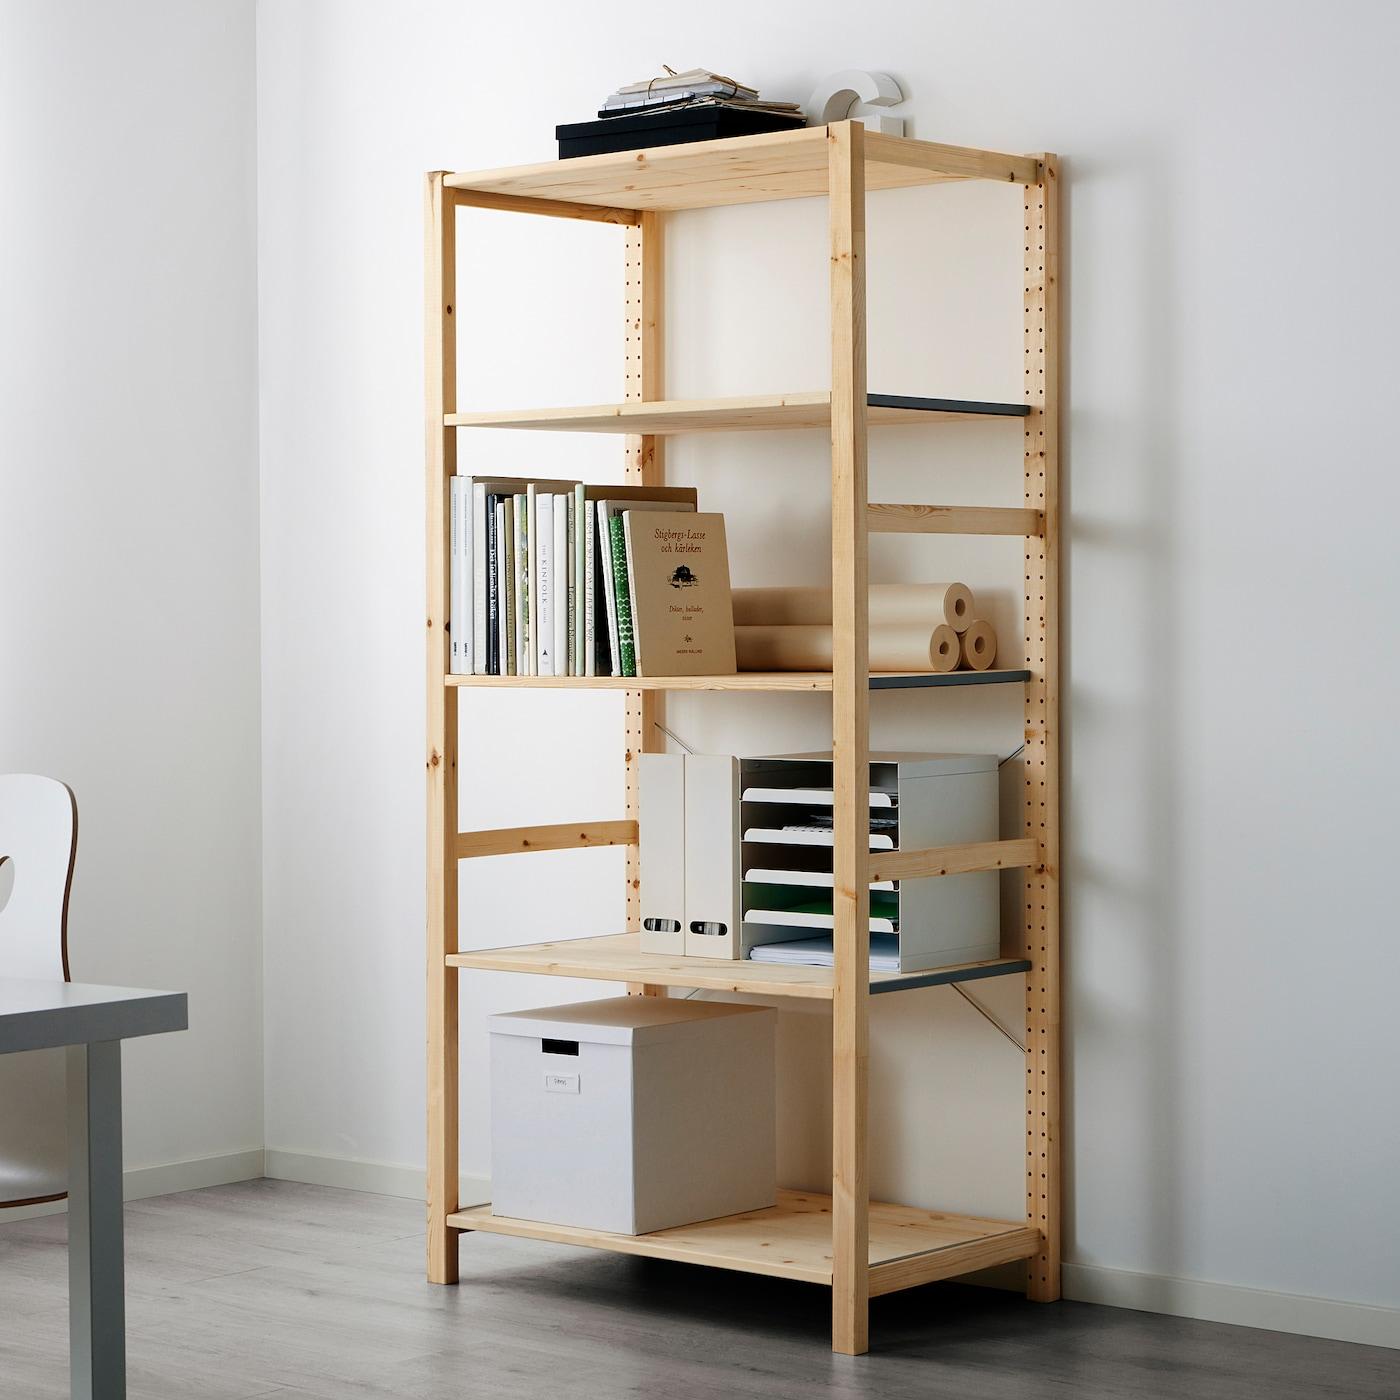 Ikea Scaffali Legno Ivar ivar shelving unit - pine 89x50x179 cm